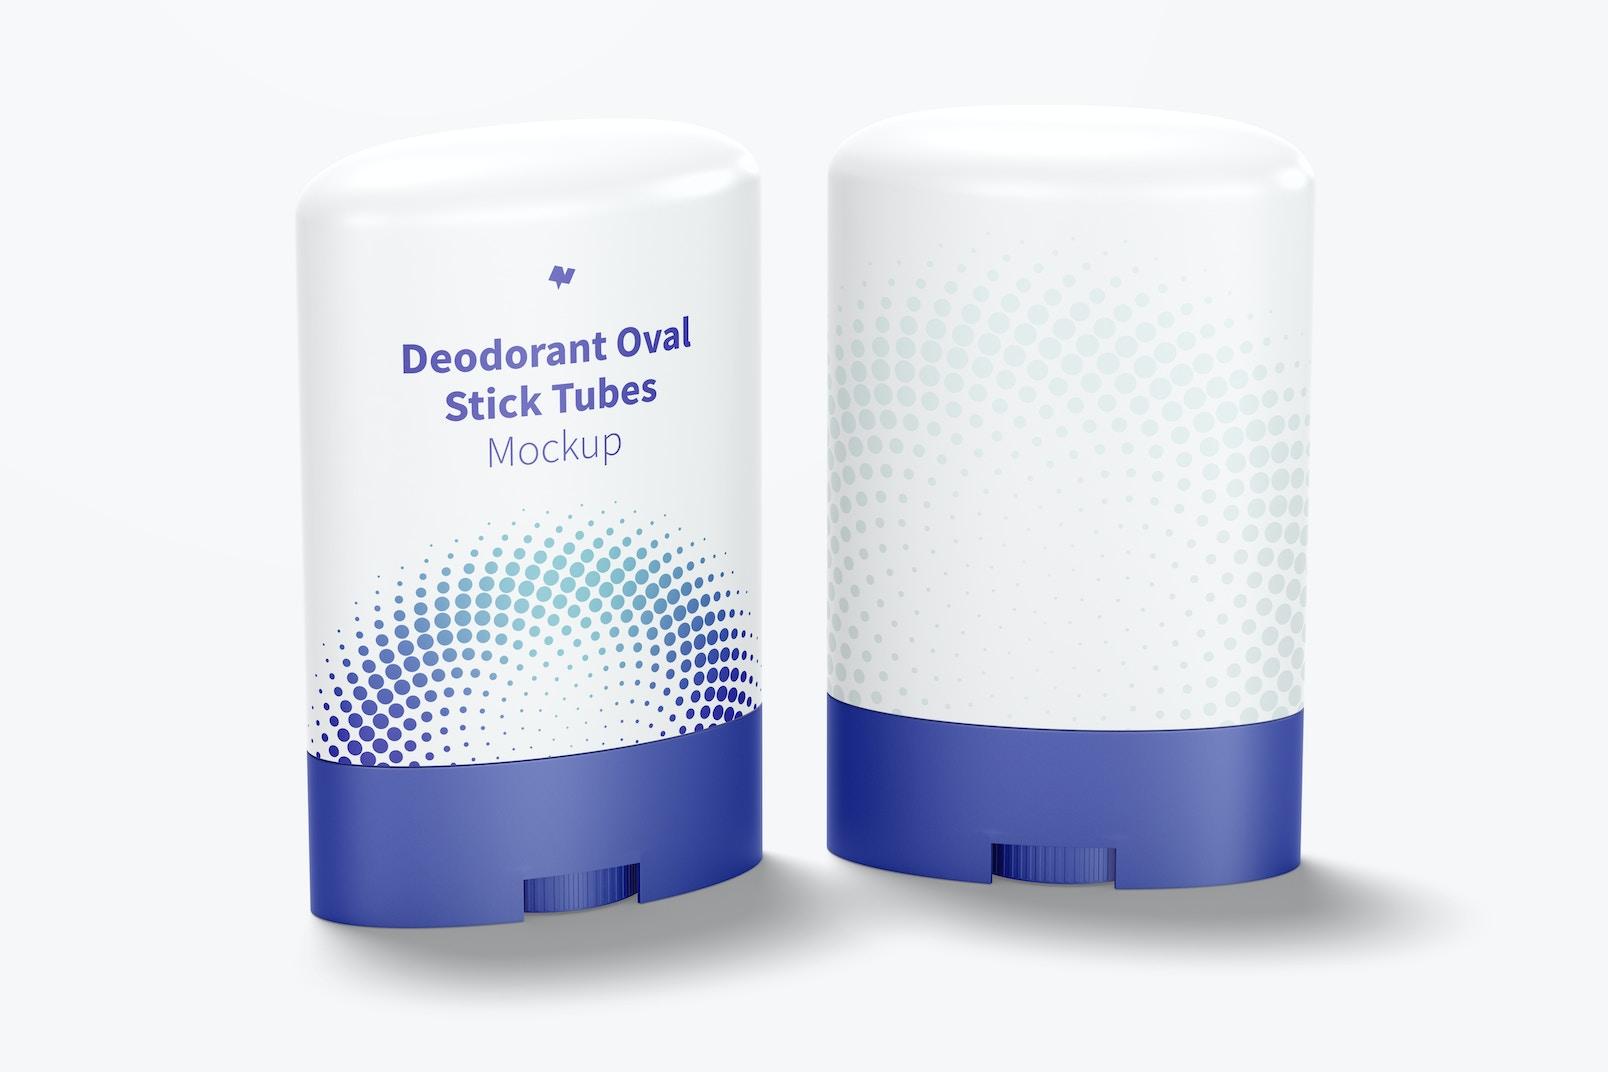 Deodorant Oval Stick Tubes Mockup, Perspective